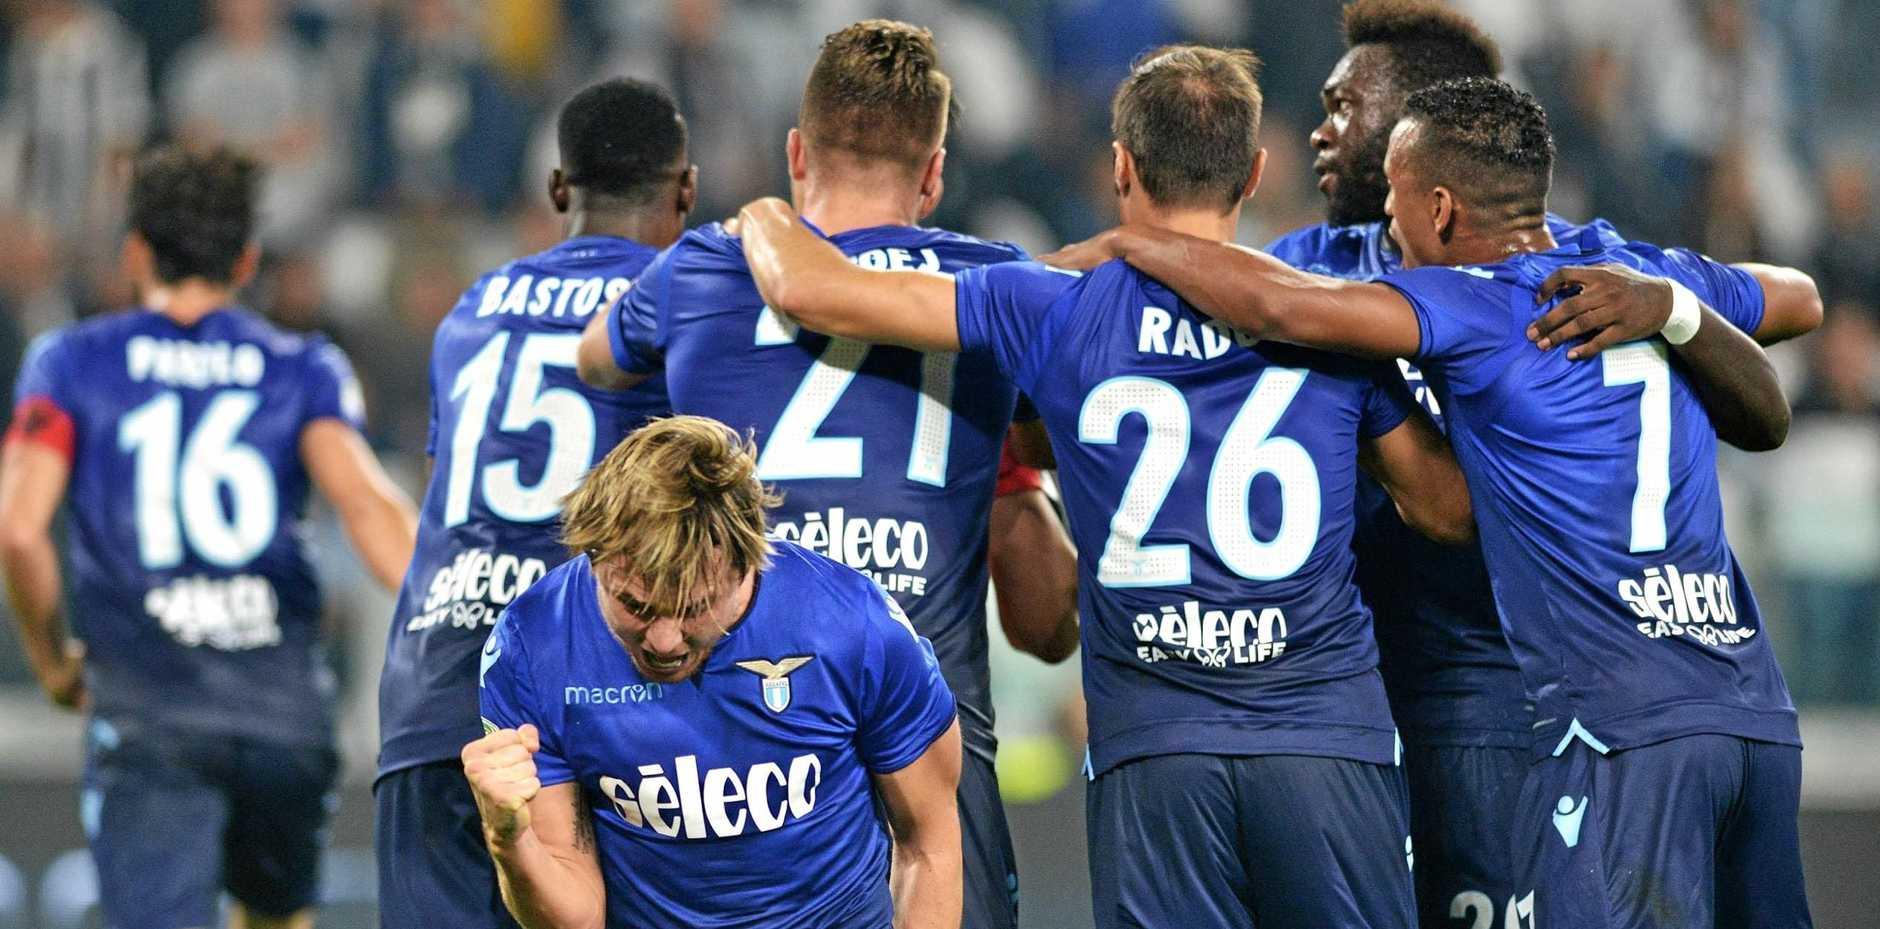 Lazio players celebrate the 2-1 win over Juventus.